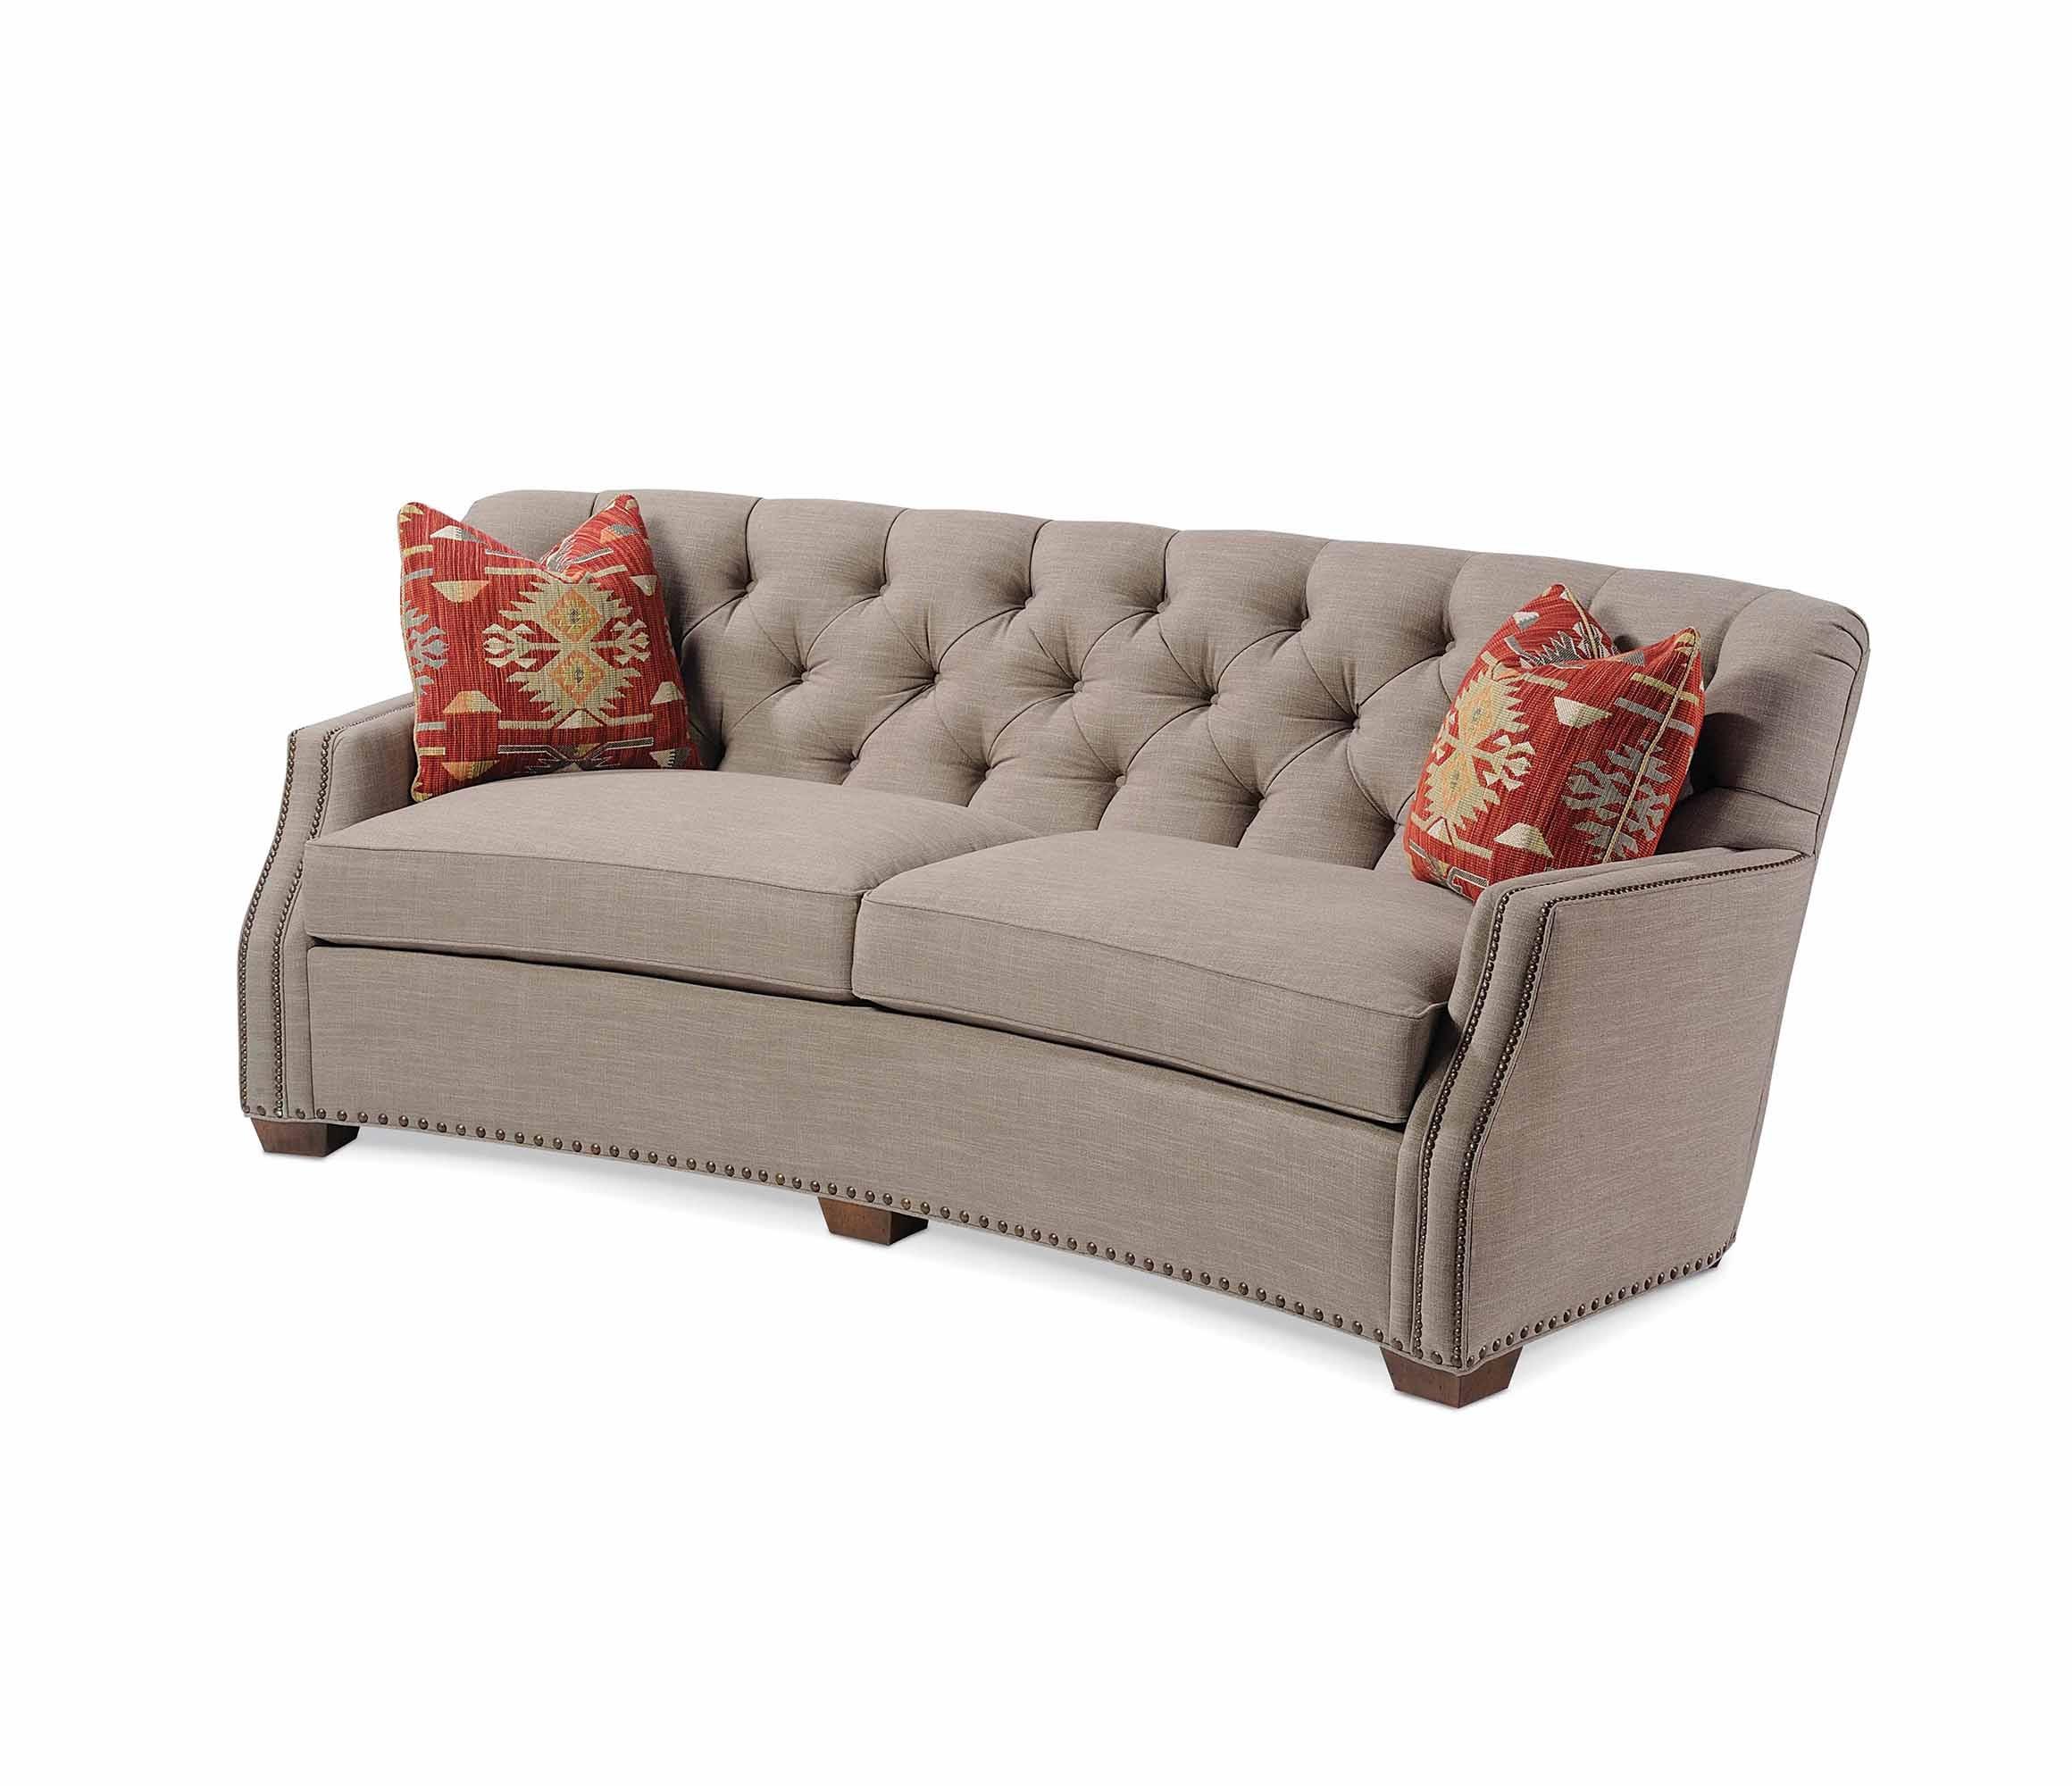 Merveilleux 3415 03. Richmond Sofa